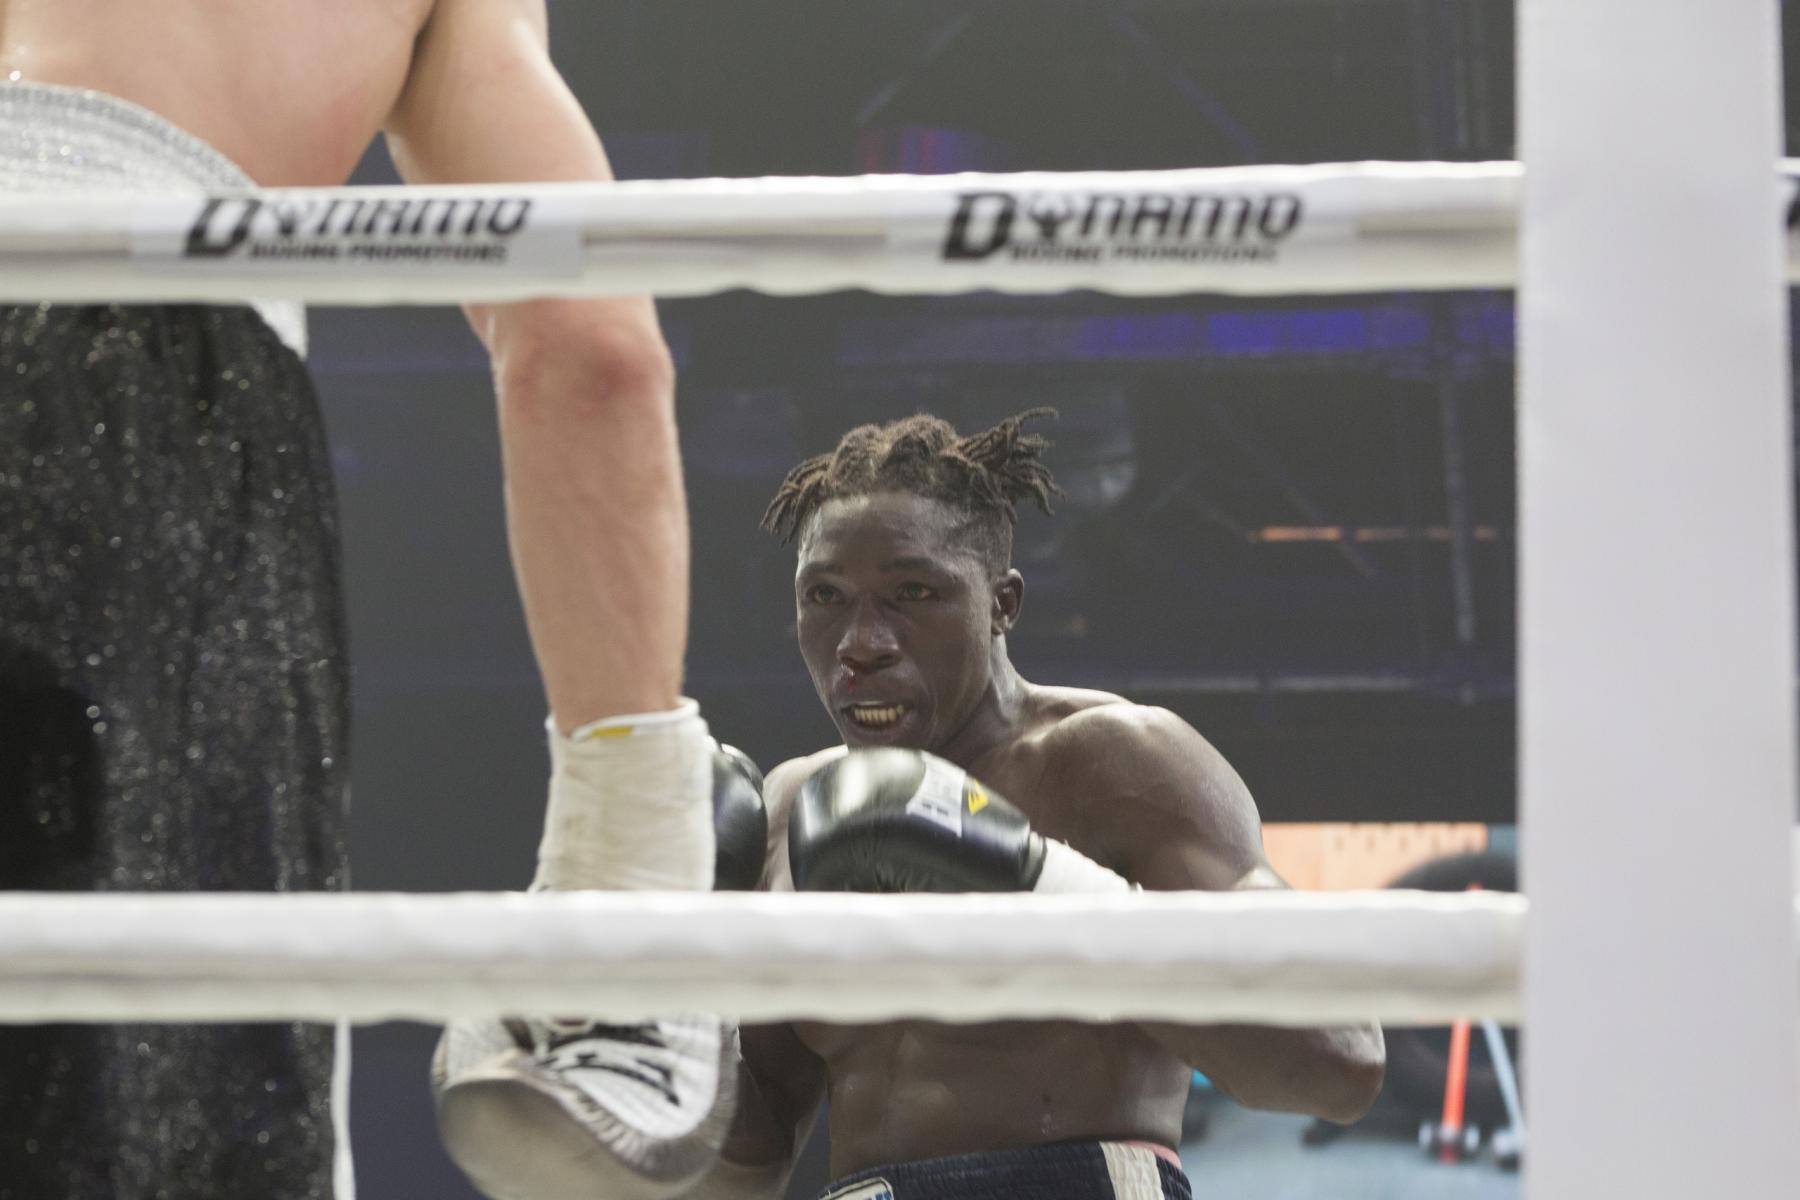 фото Боксёр из Новосибирска Павел Силягин стал азиатско-тихоокеанским чемпионом WBO 4